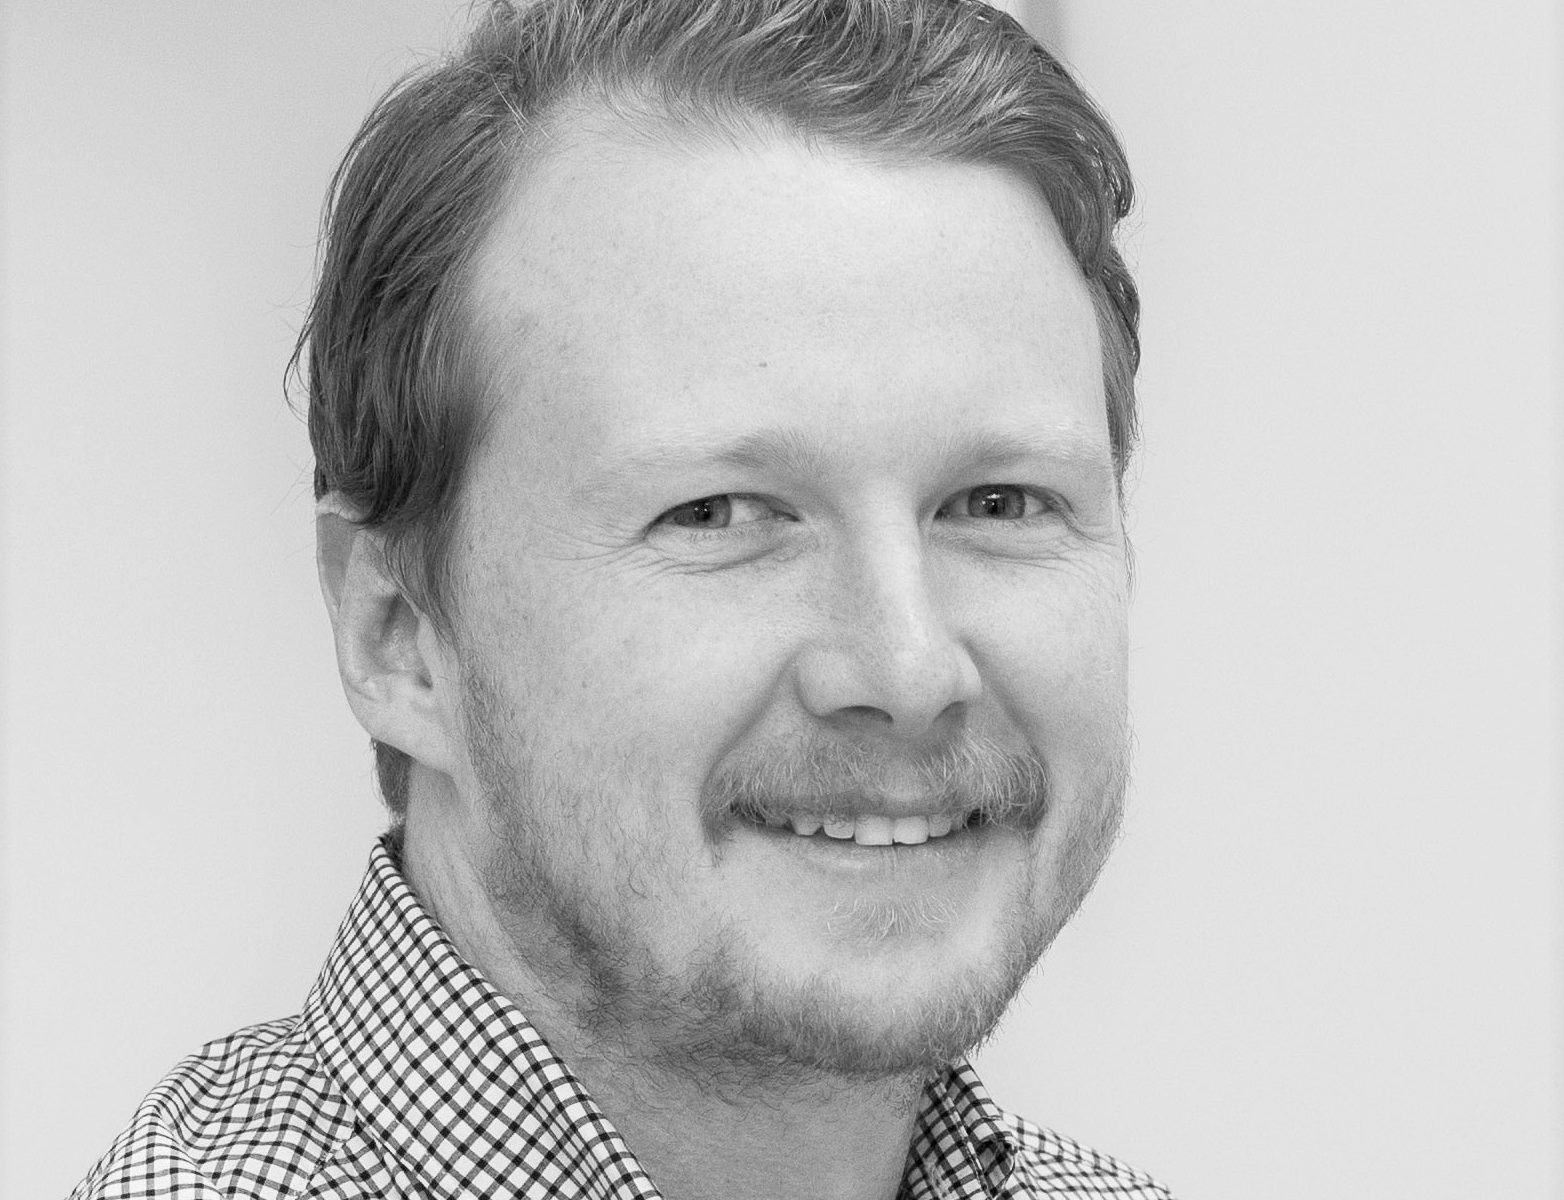 Podiatrist Matthew Bence